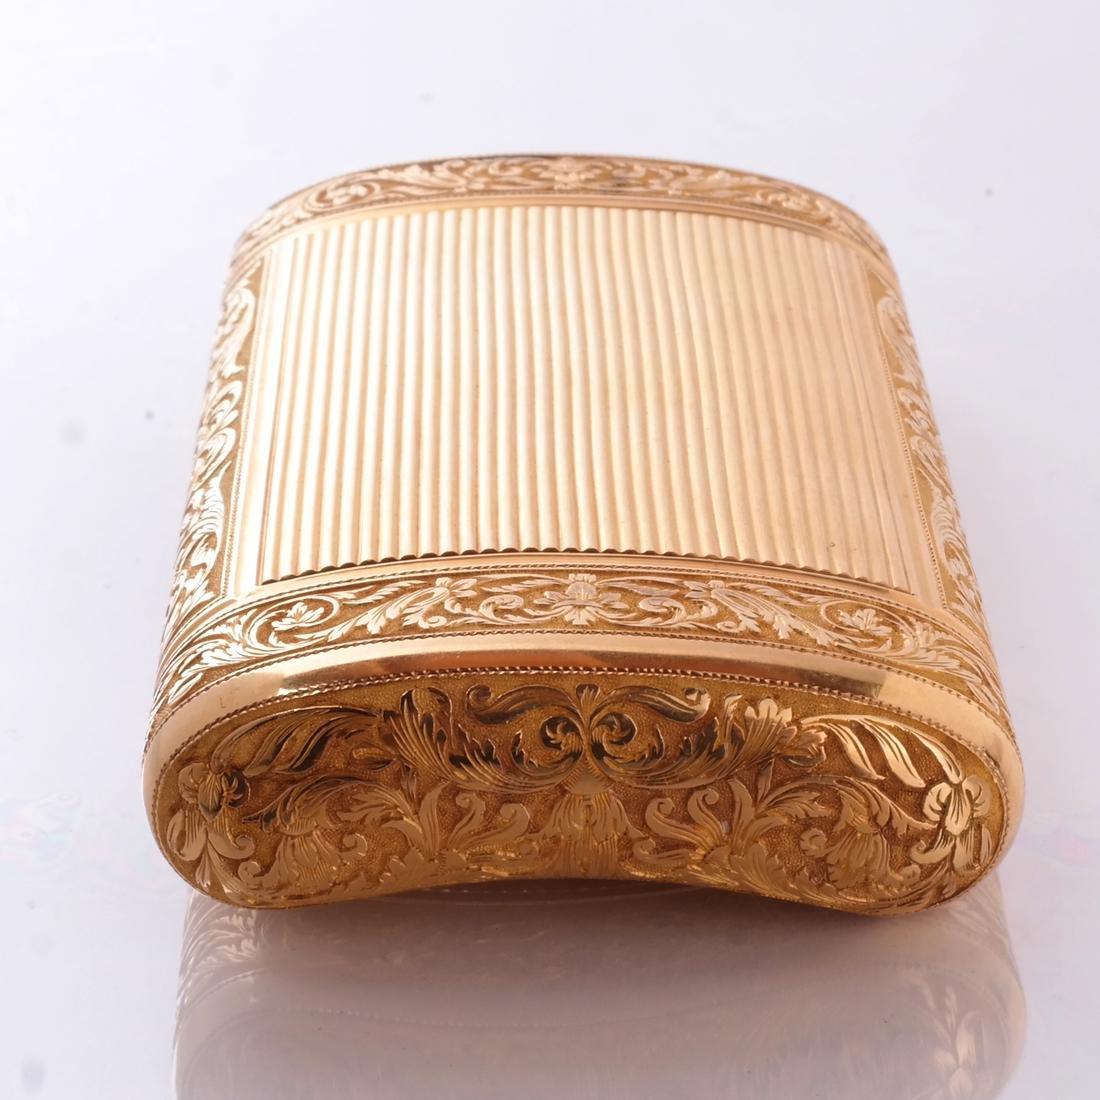 French 18k Gold Snuff Box - 3